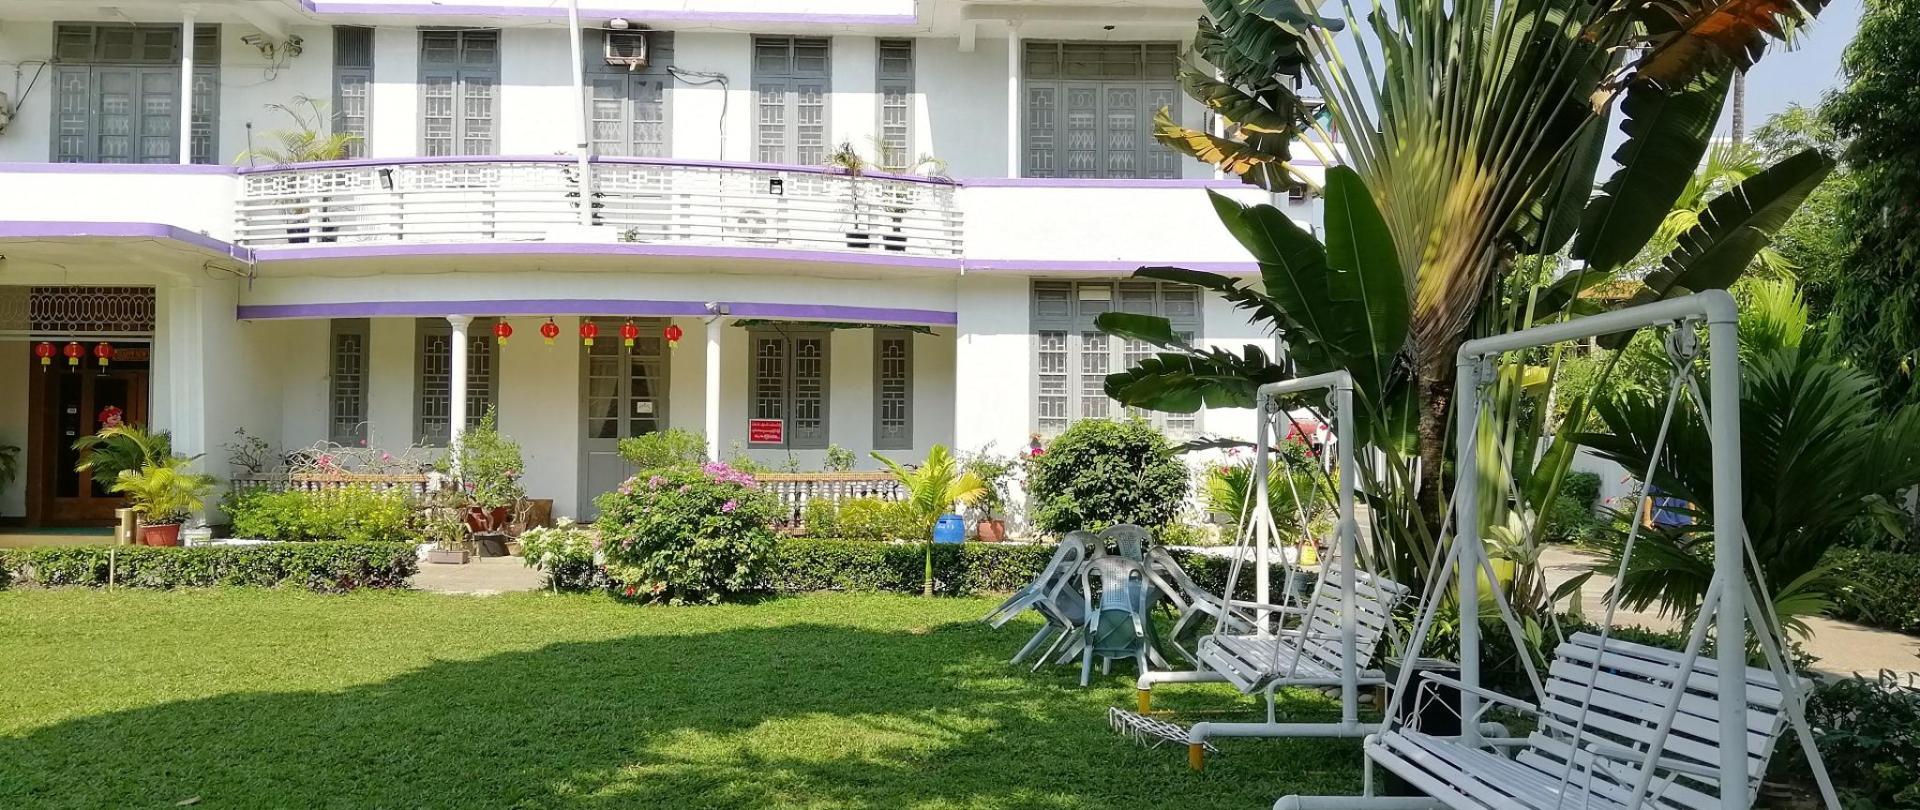 Hotel Garden.jpg